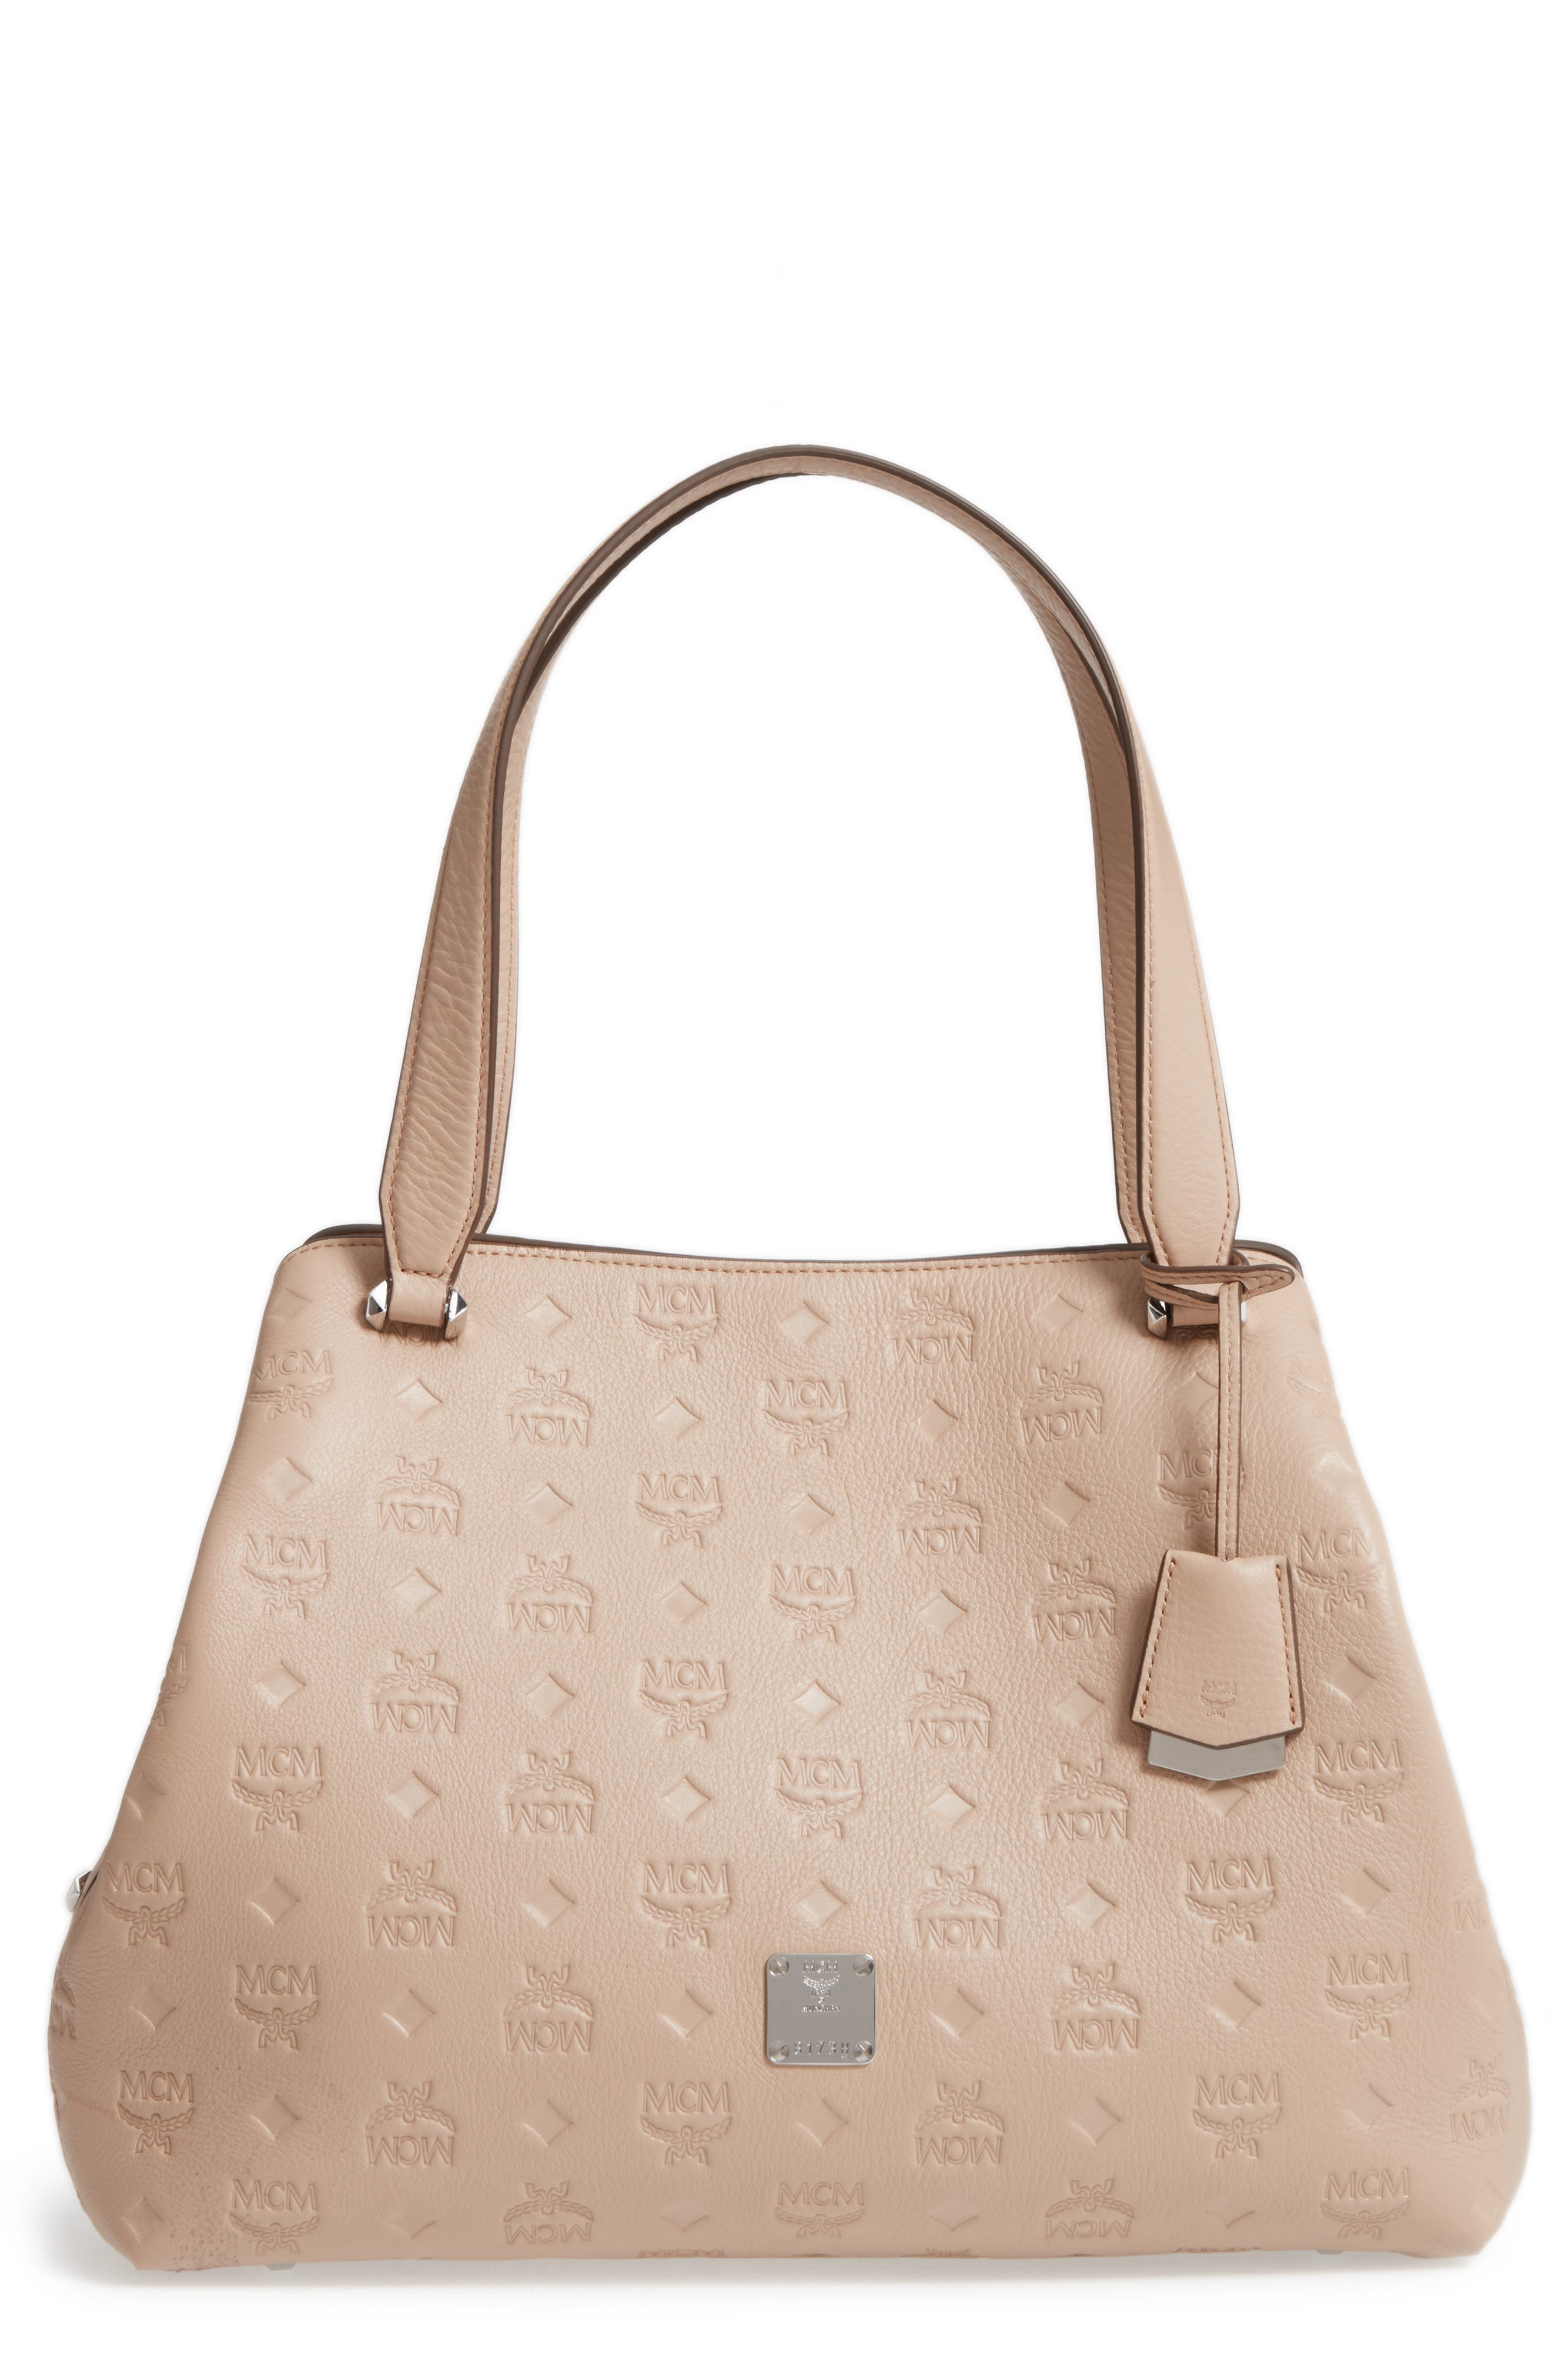 Alternate Image 1 Selected - MCM Signature Monogrammed Leather Handbag